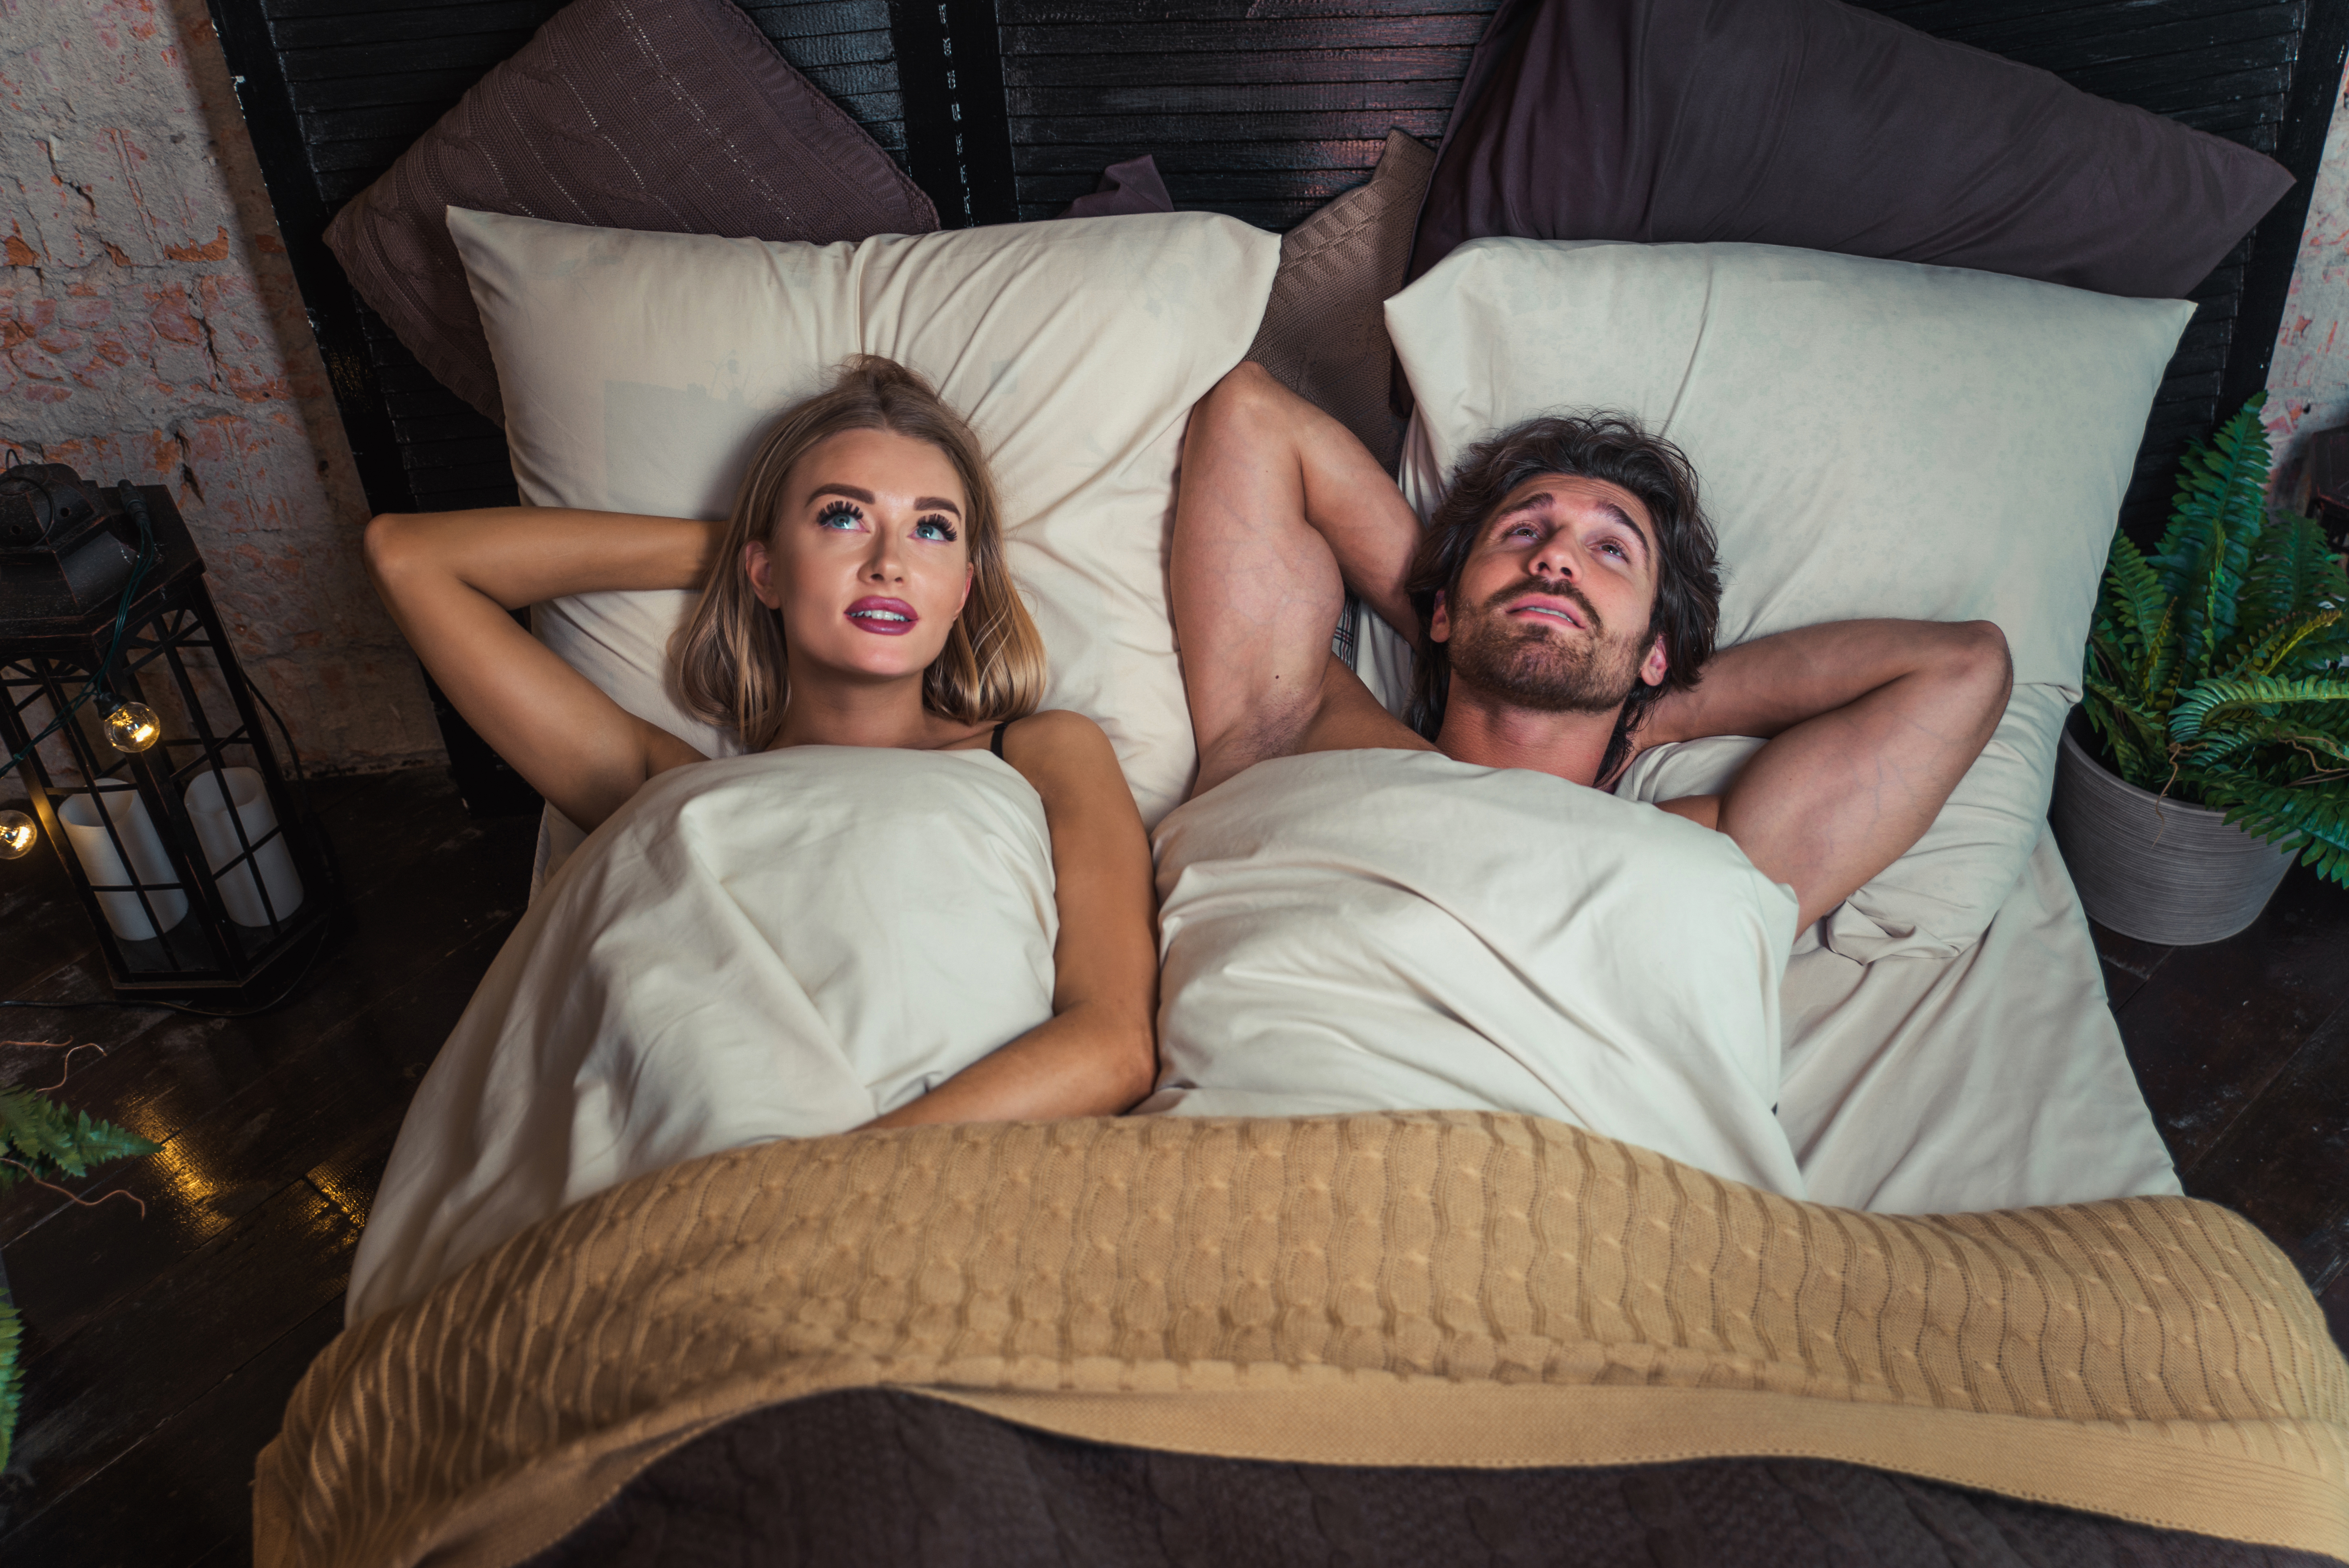 Couple just had sex